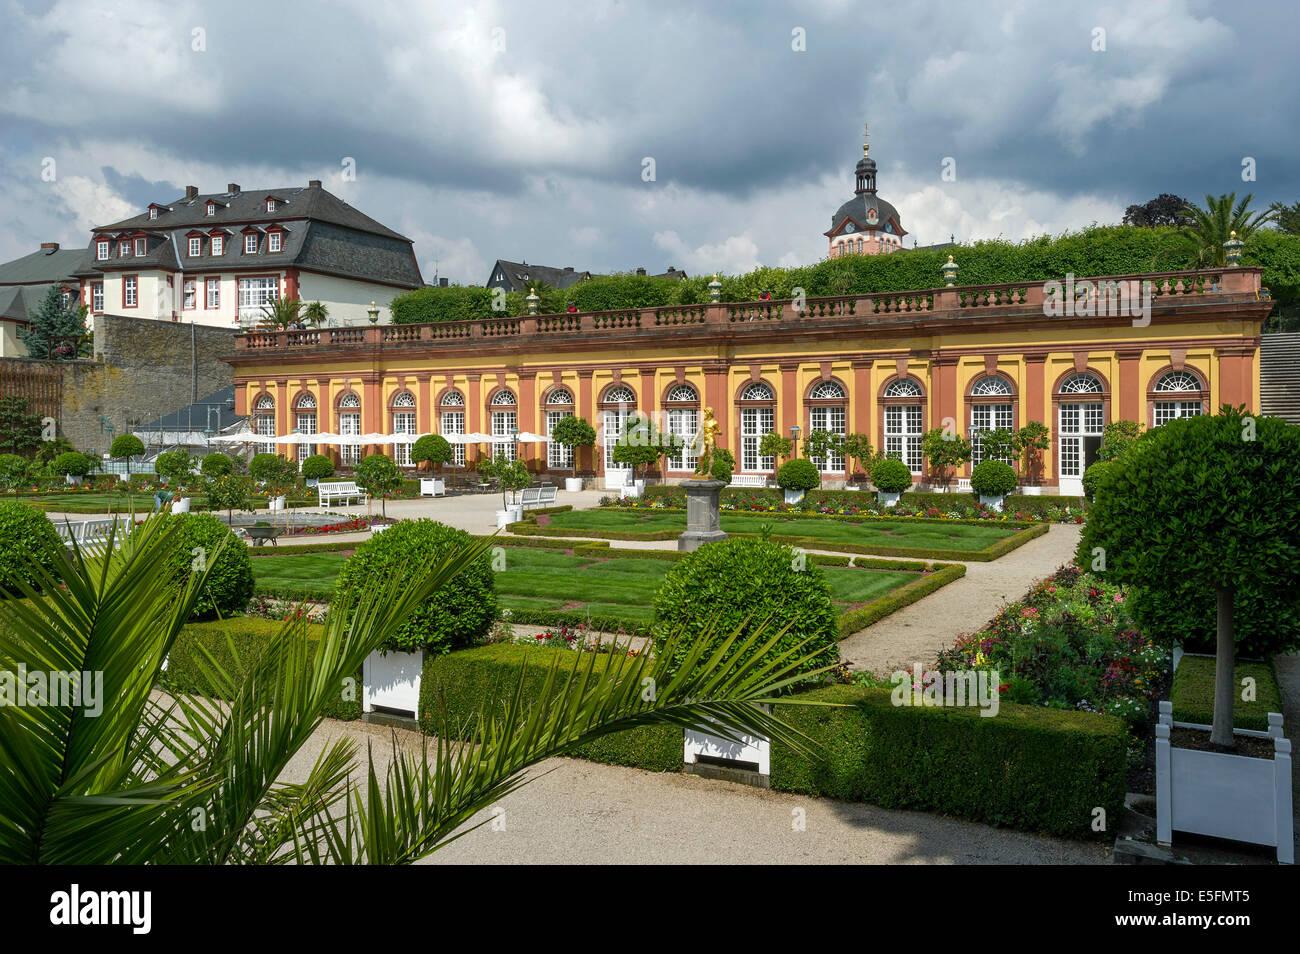 Single weilburg °HOTEL SCHLOSSHOTEL WEILBURG 4* (Germany) - from US$ , BOOKED